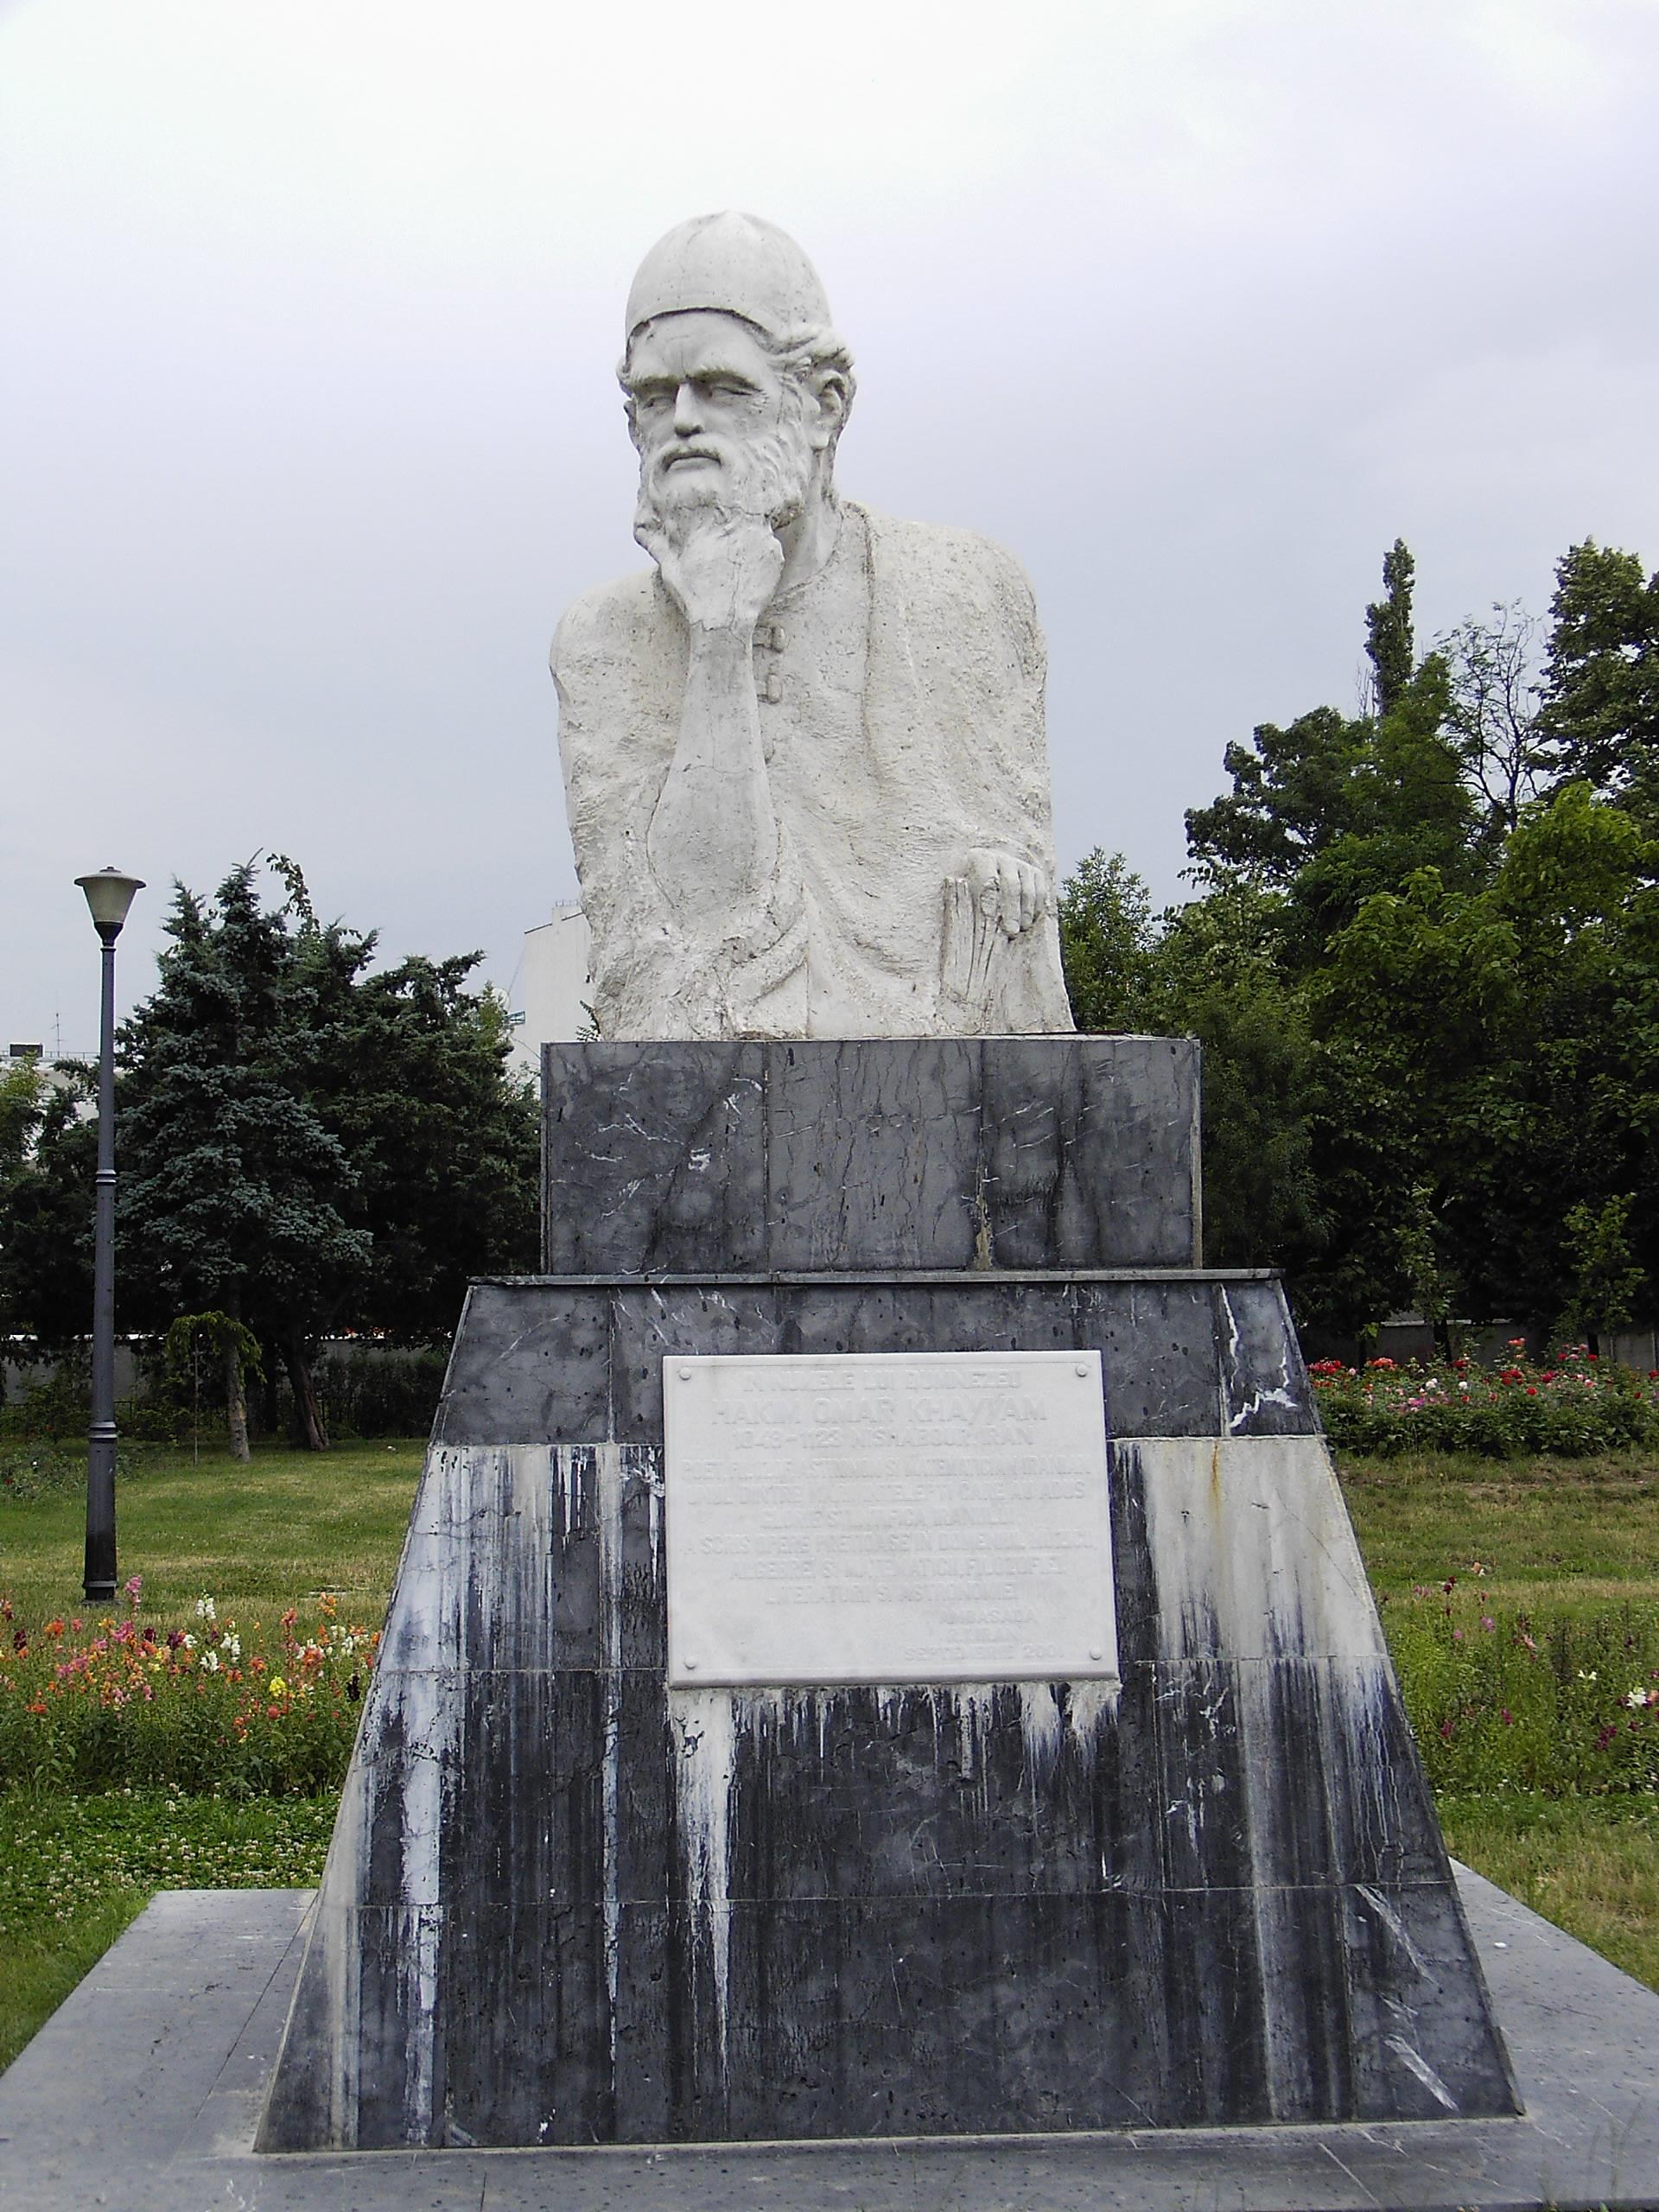 Monumento a Omar Jayam en Bucarest, Rumania.